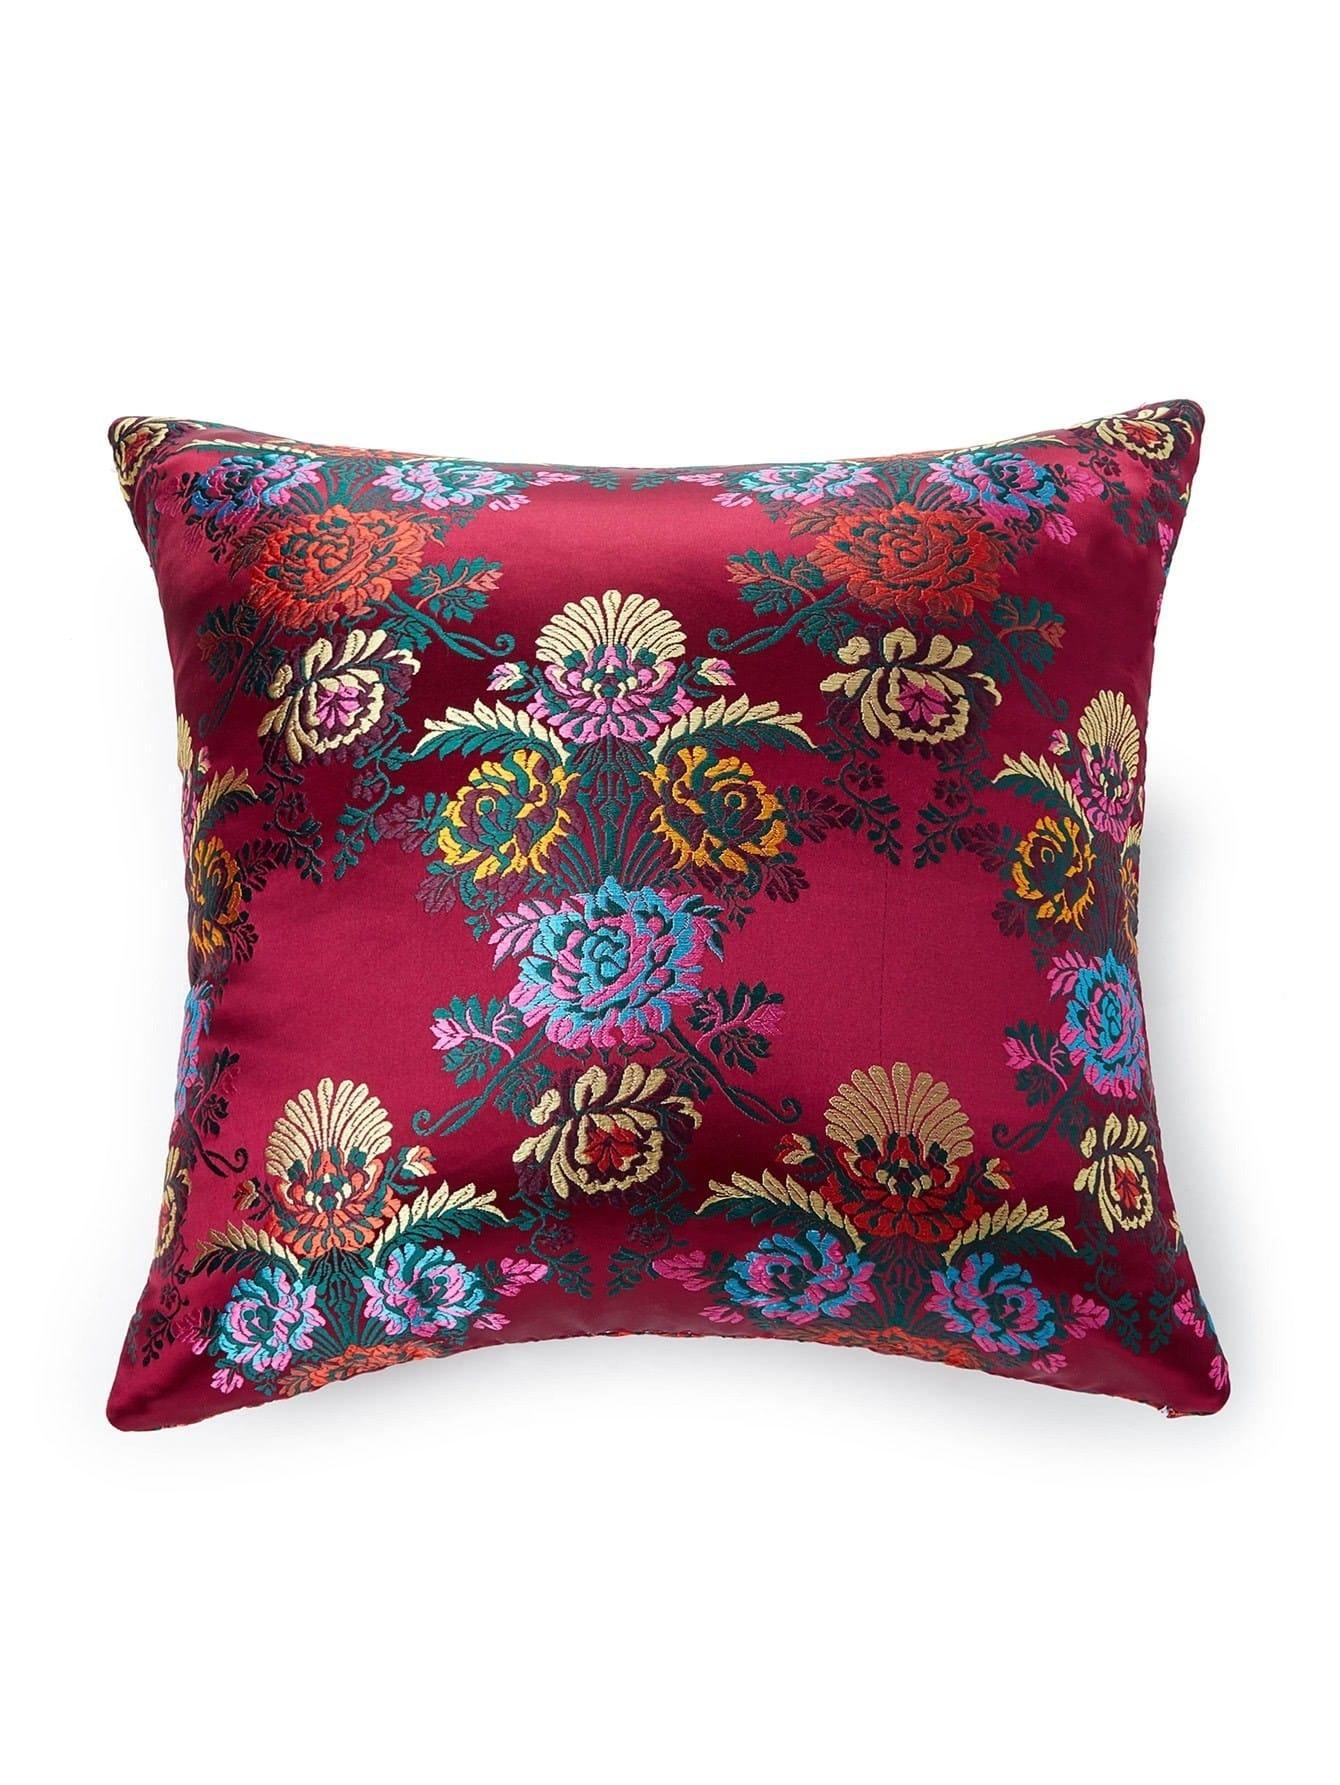 Jacquard Satin Pillowcase Cover pillow171207303